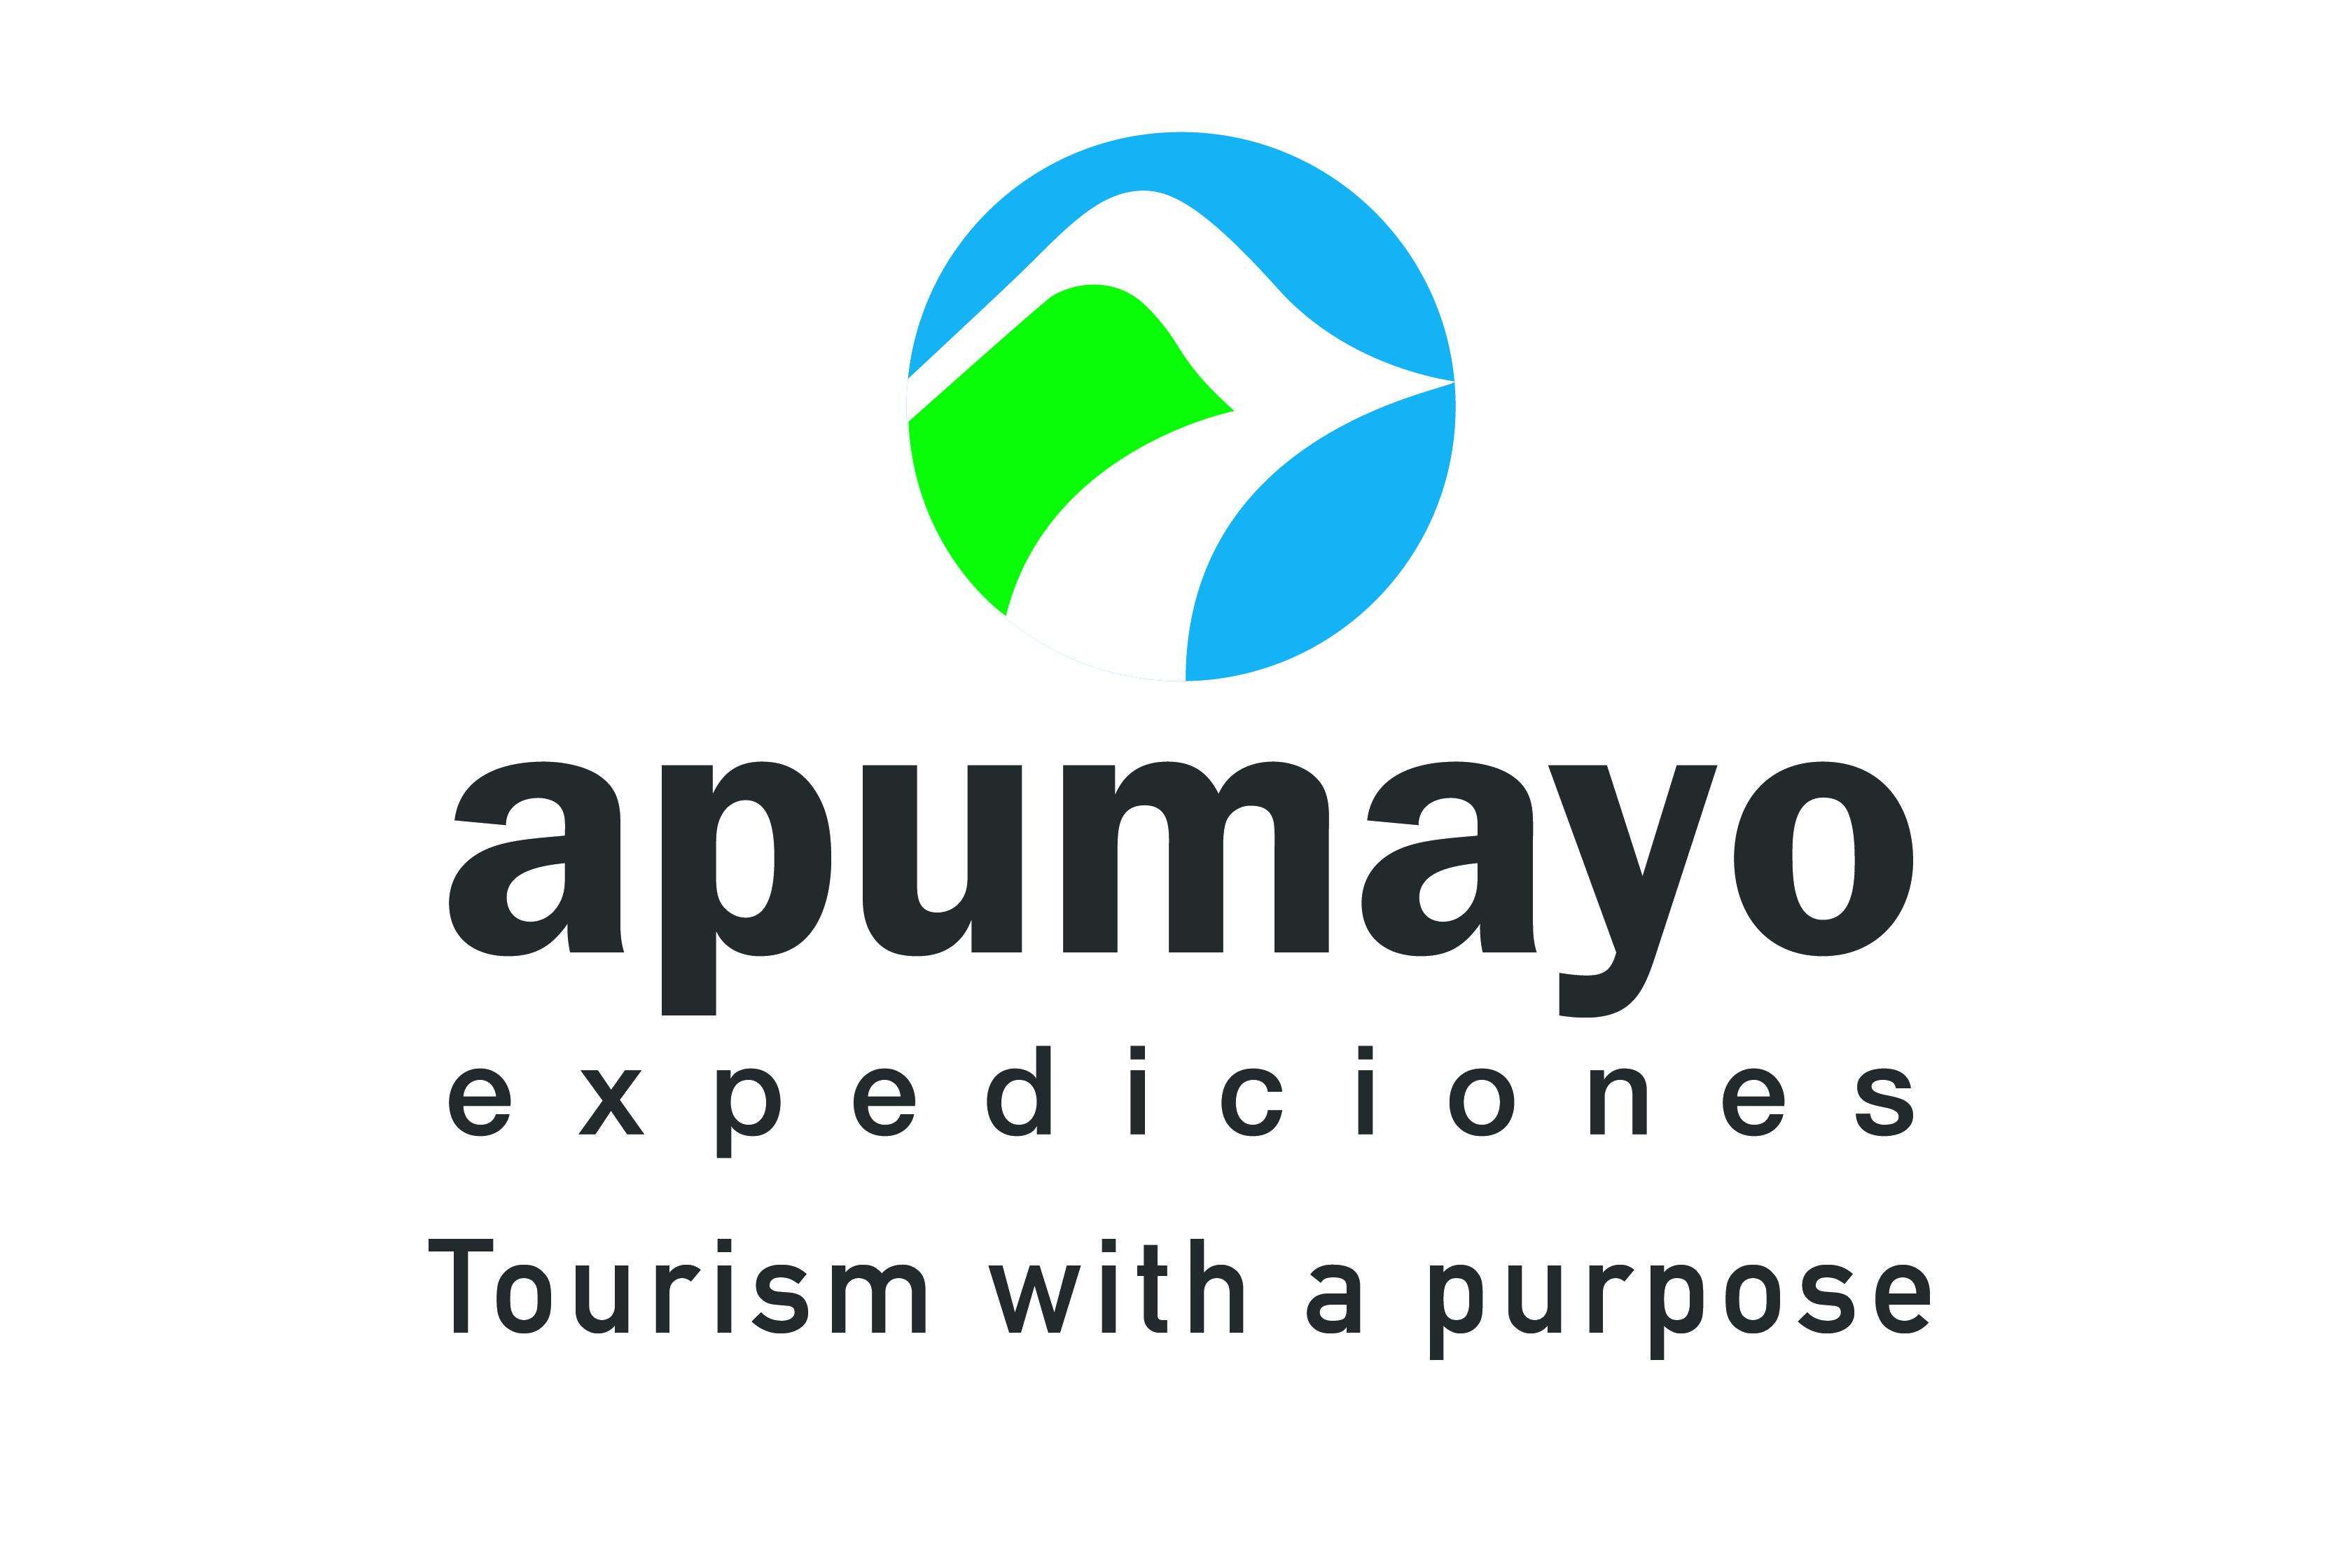 Apumayo